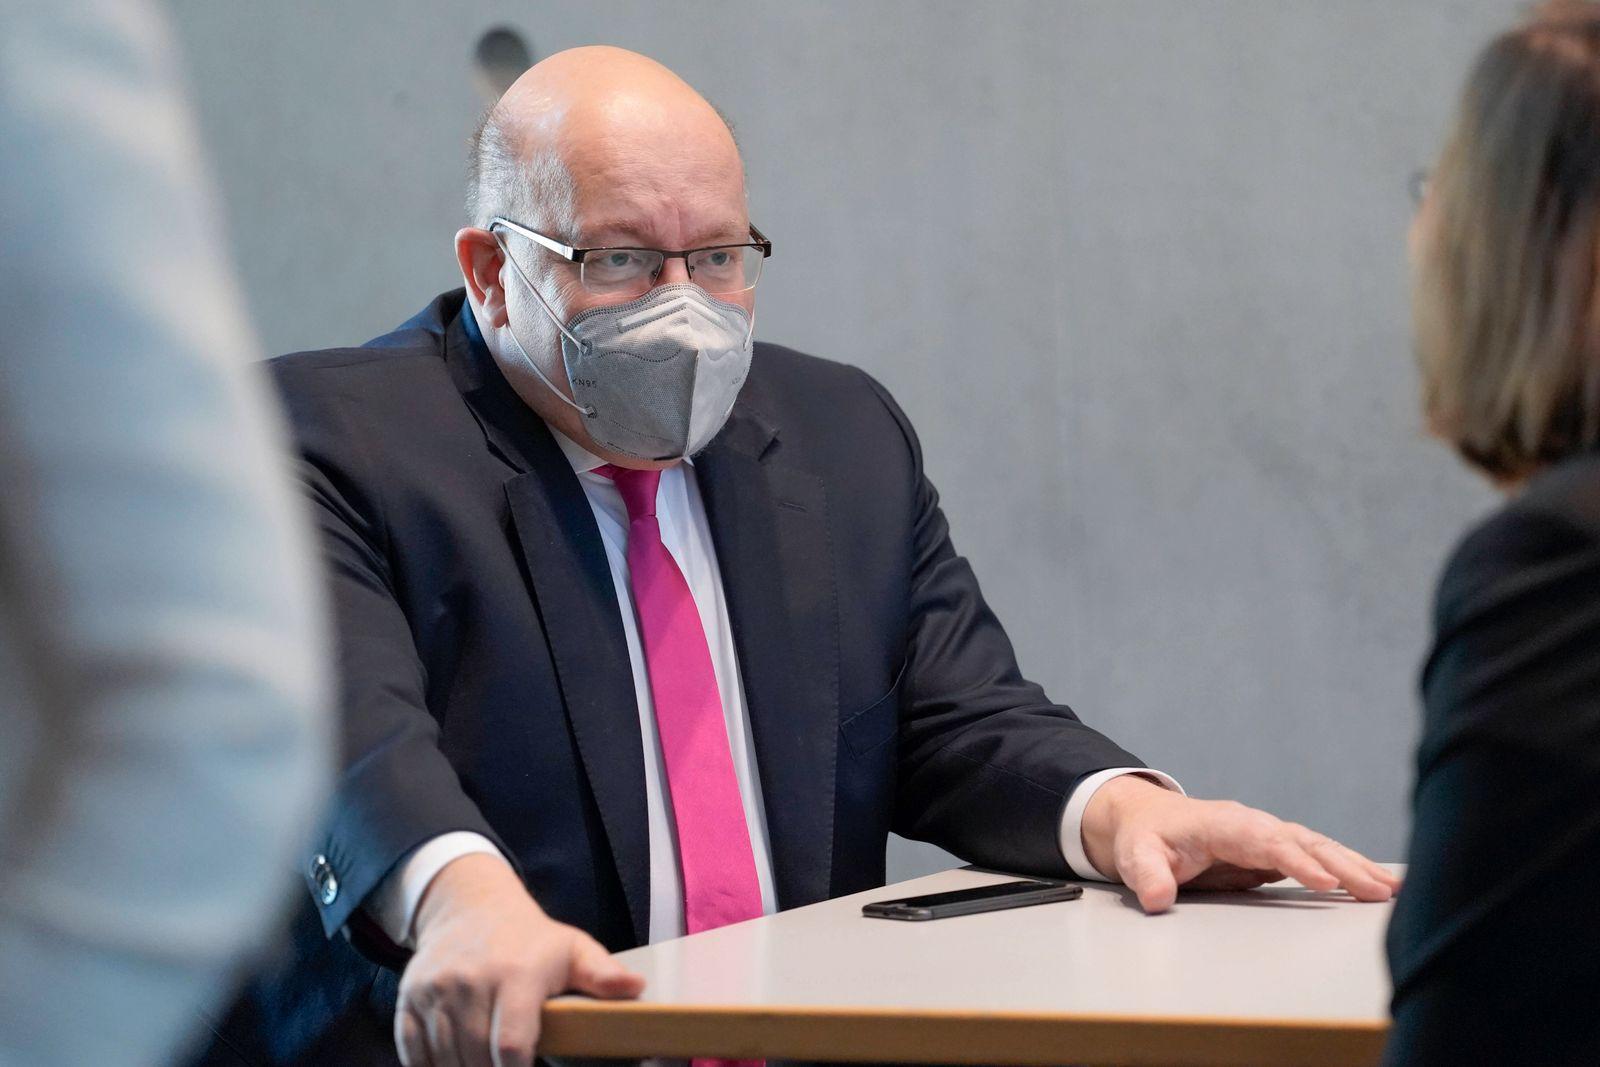 3. Untersuchungsausschuss Wirecard Aktuell, 20.04.2021, Berlin, Peter Altmaier der Bundesminister fuer Wirtschaft und E